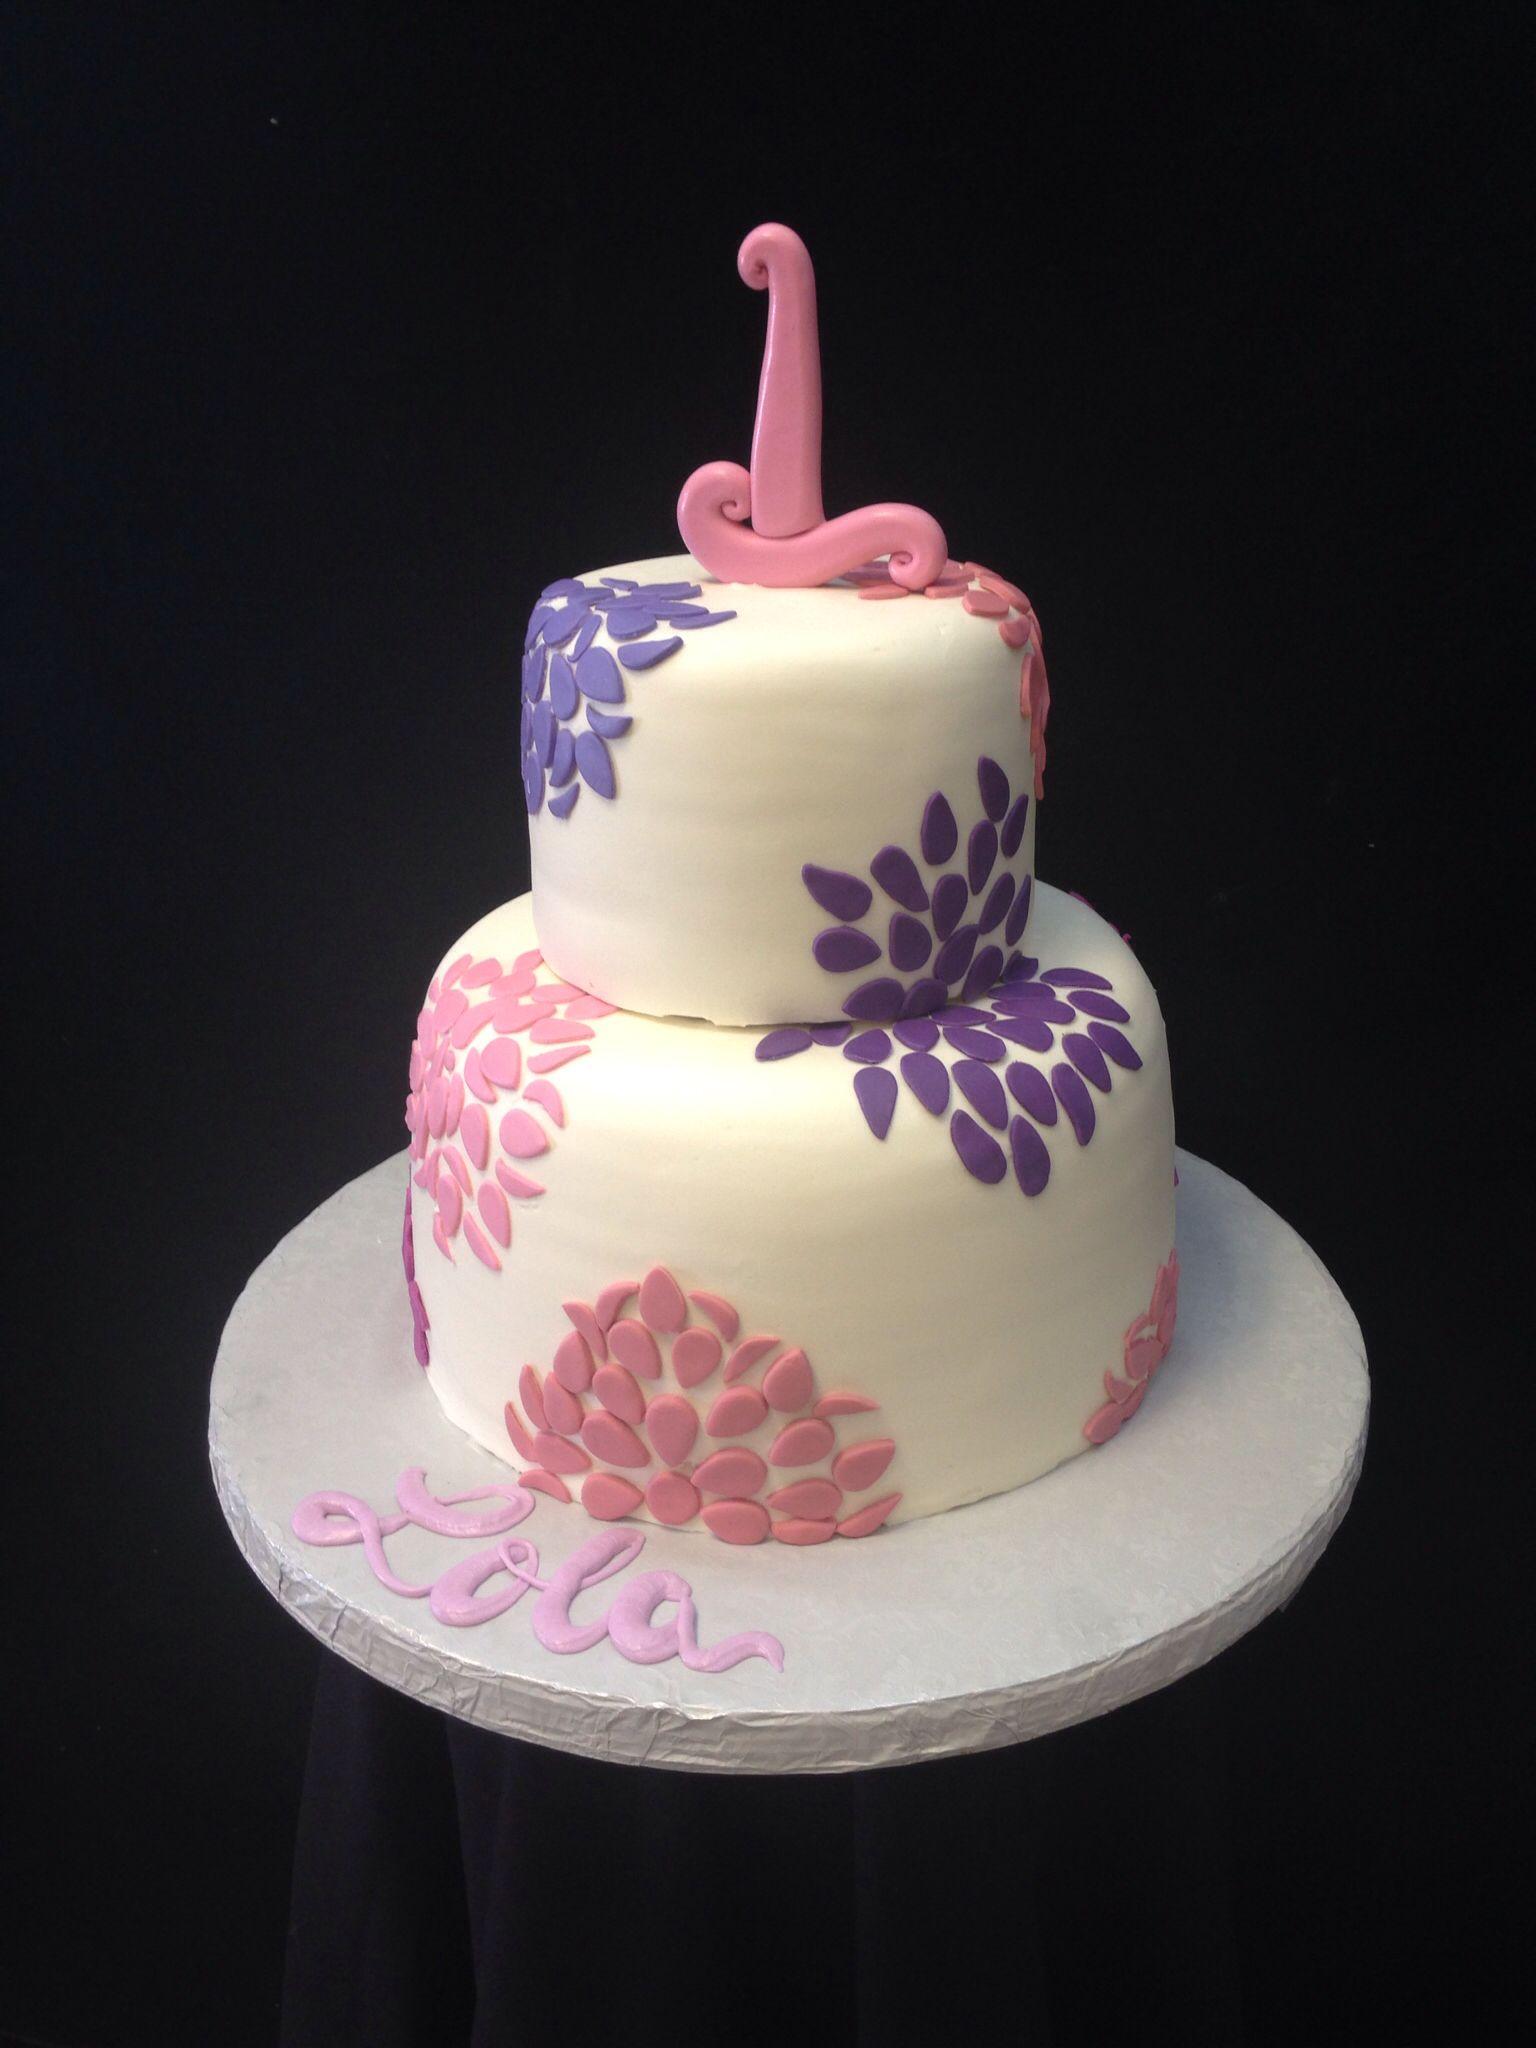 Royalty Cakes Chino California #la #cakes